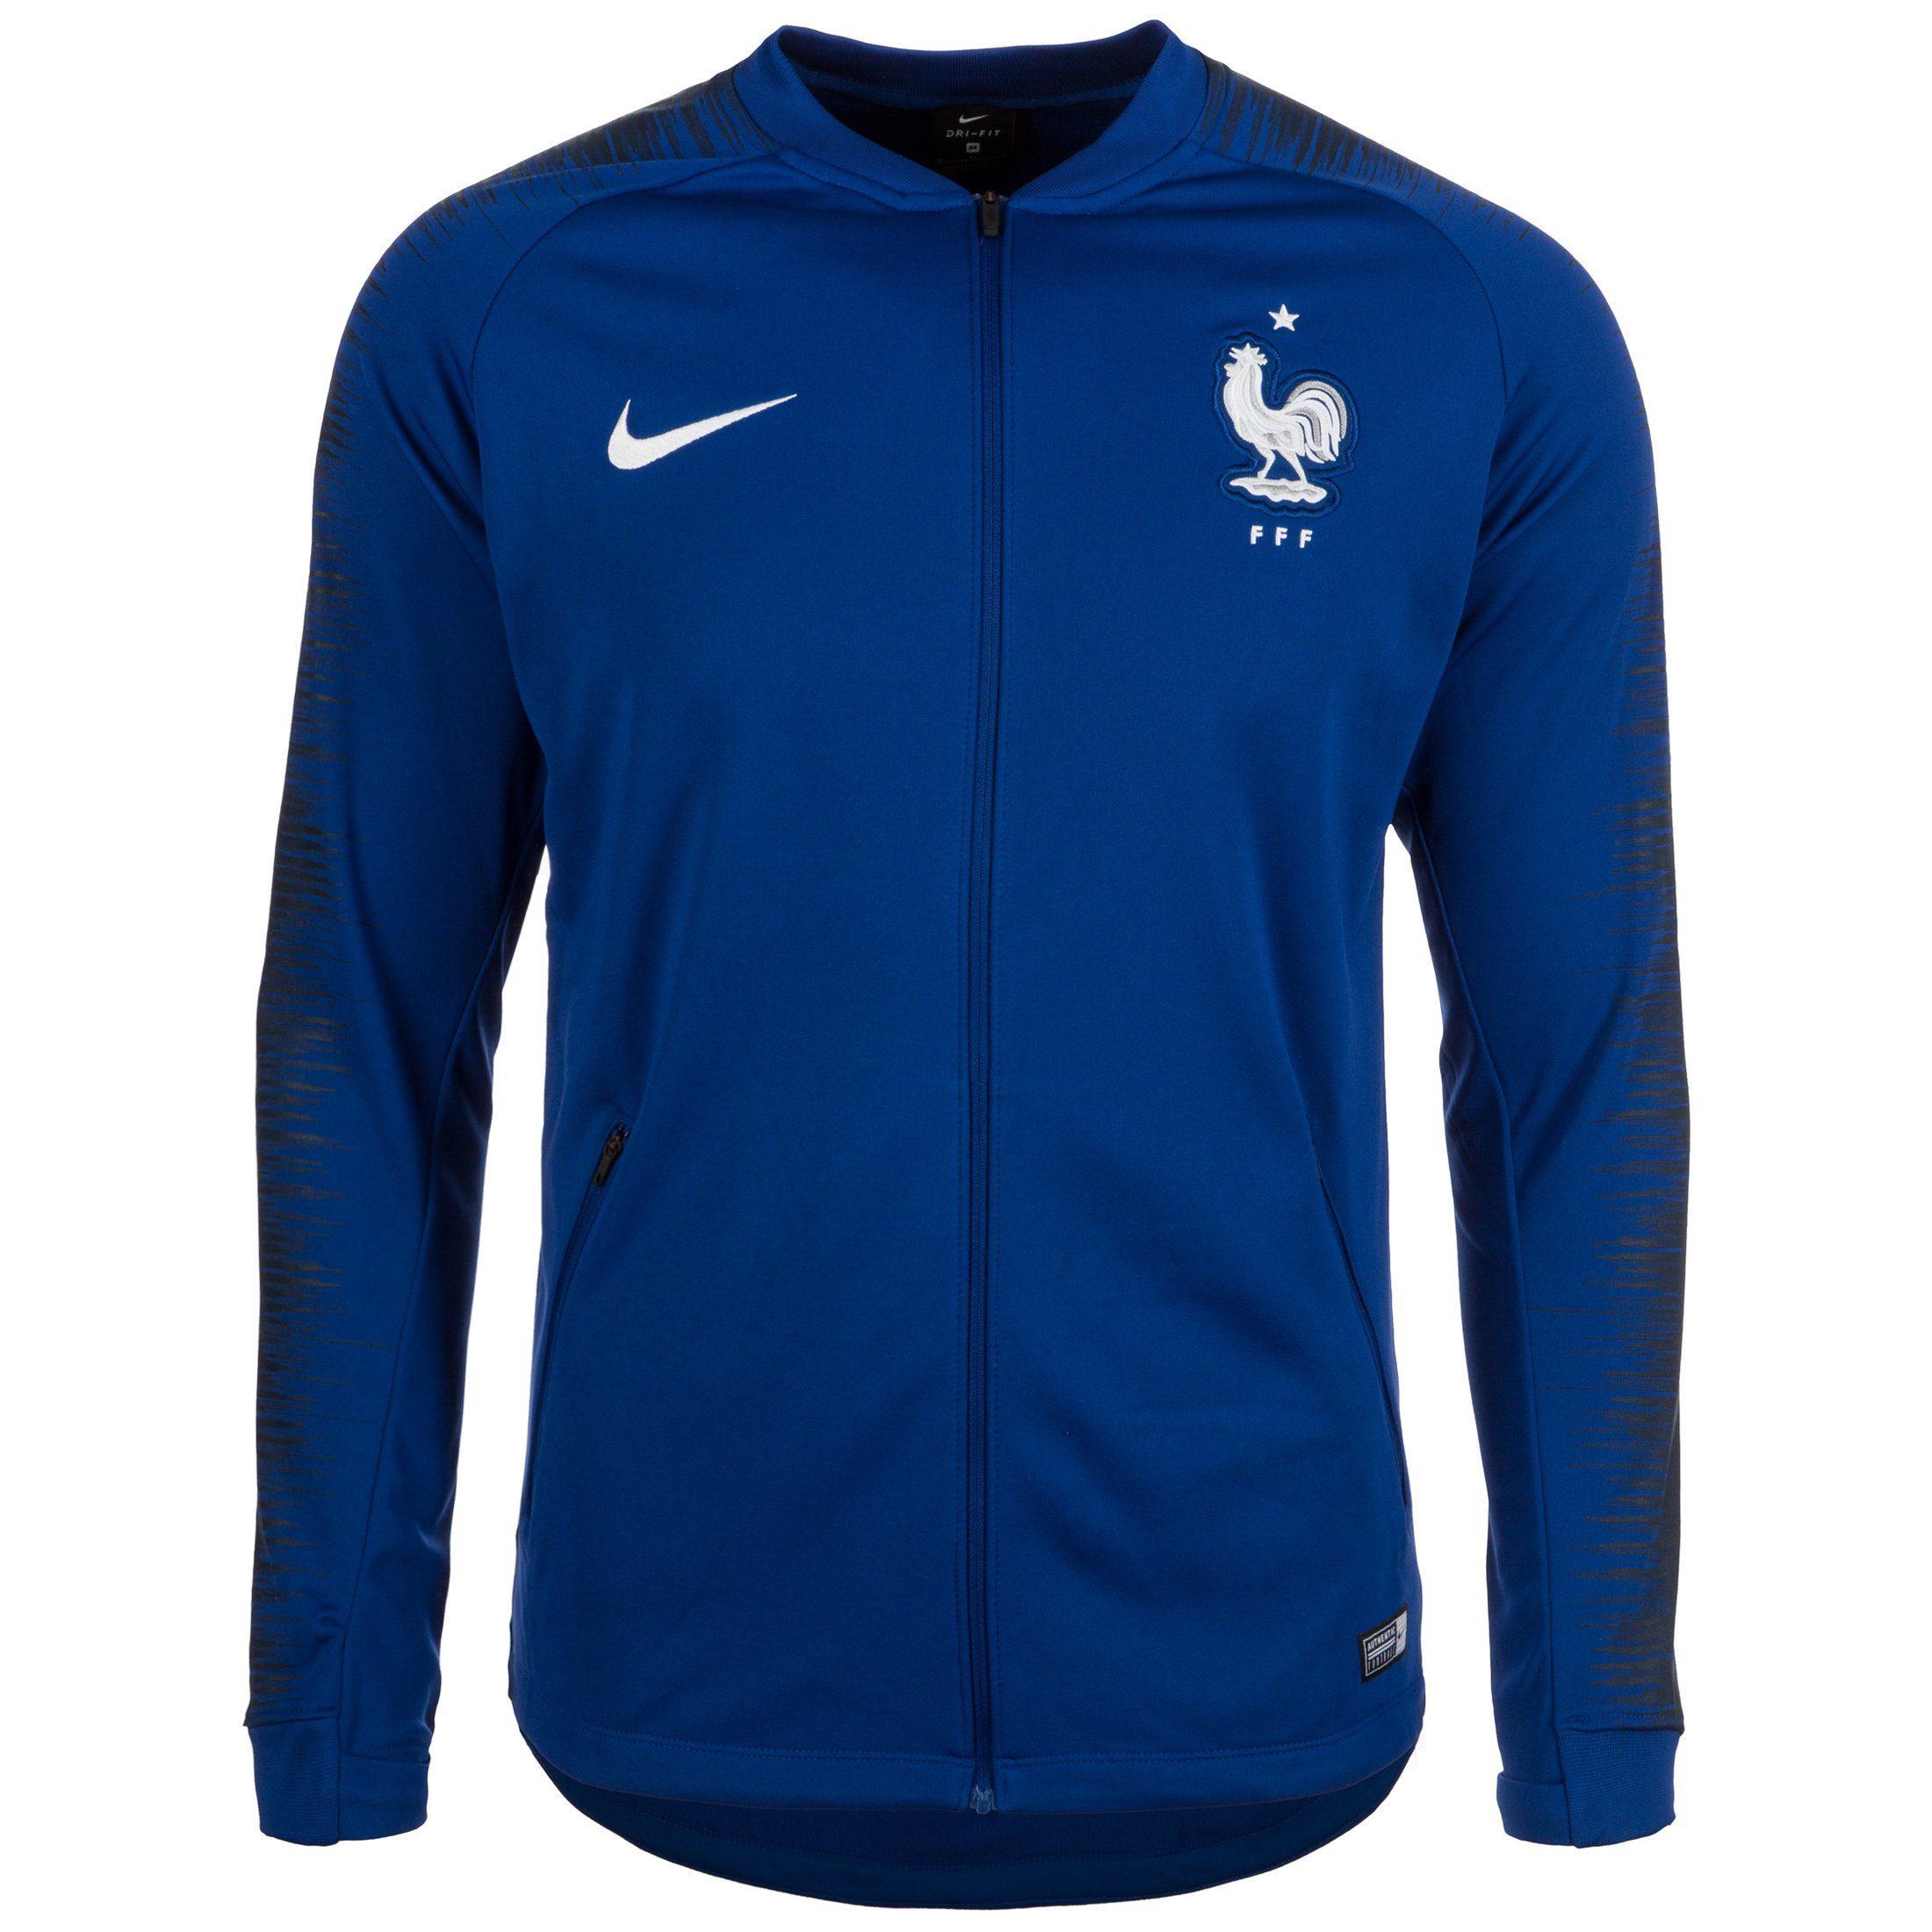 Nike Trainingsjacke »Frankreich Anthem Wm 2018«   Sportbekleidung > Sportjacken > Trainingsjacken   Blau   Wm   NIKE